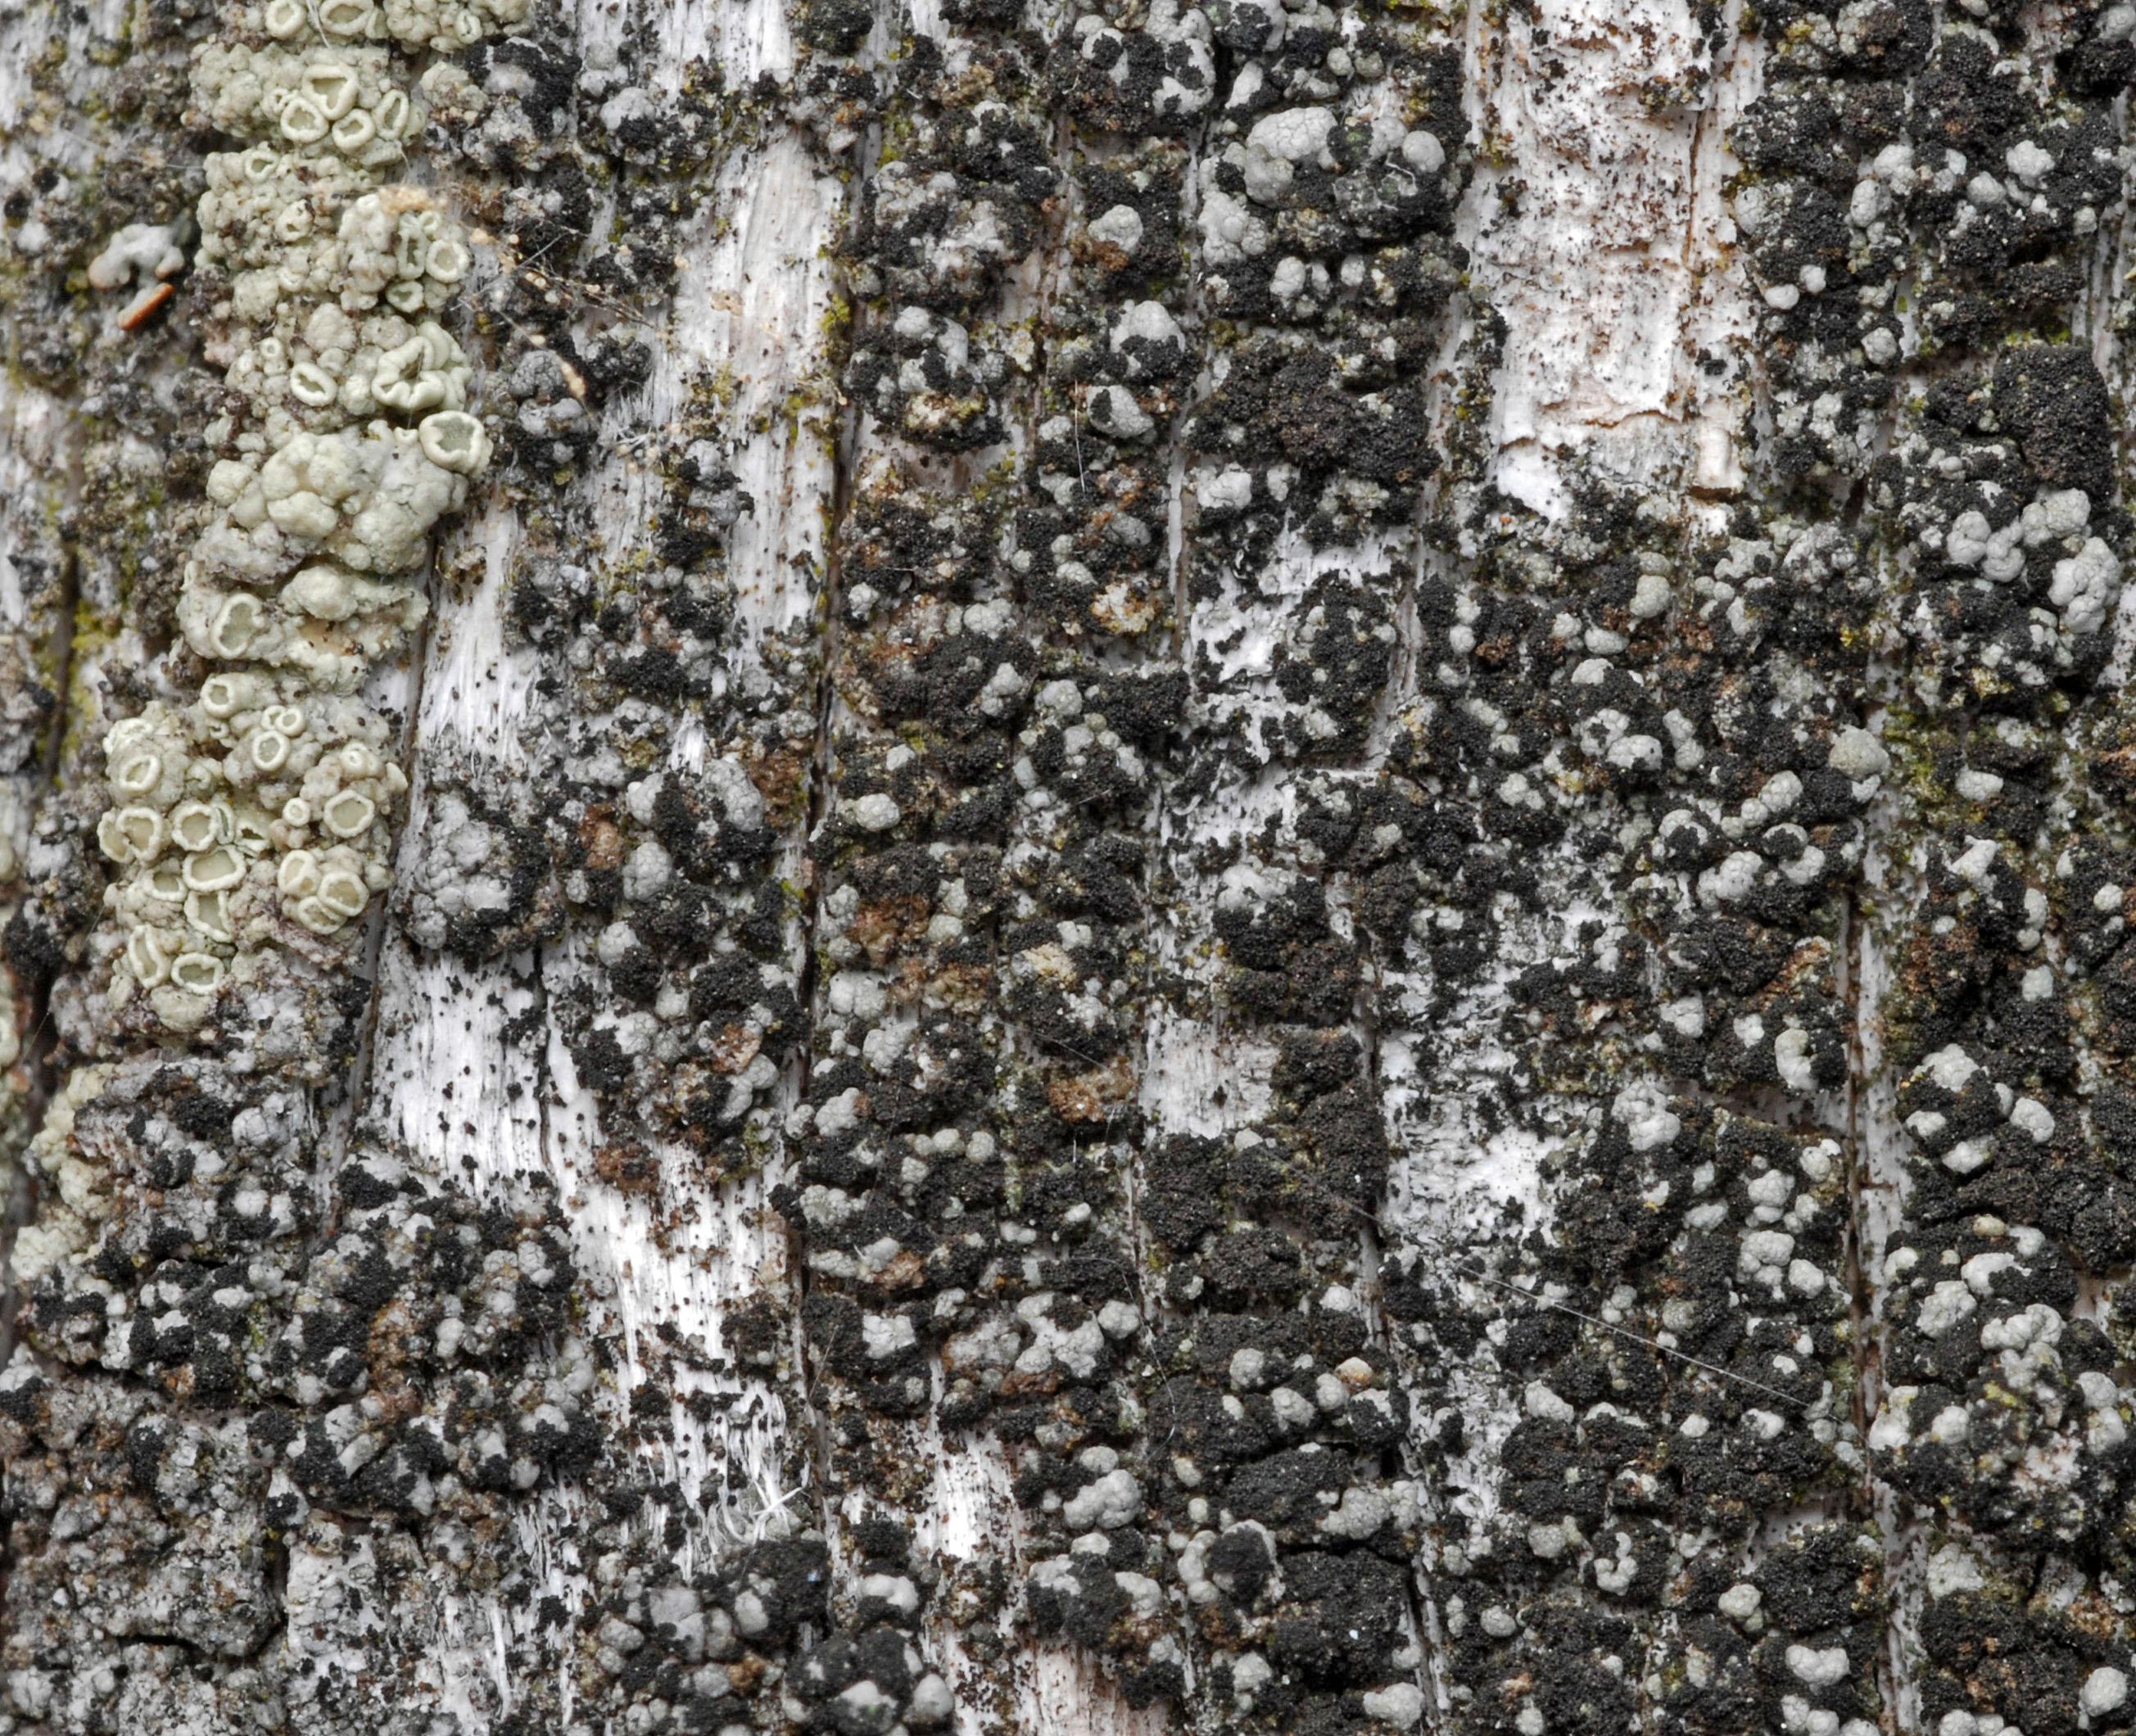 Thelomma ocellatum